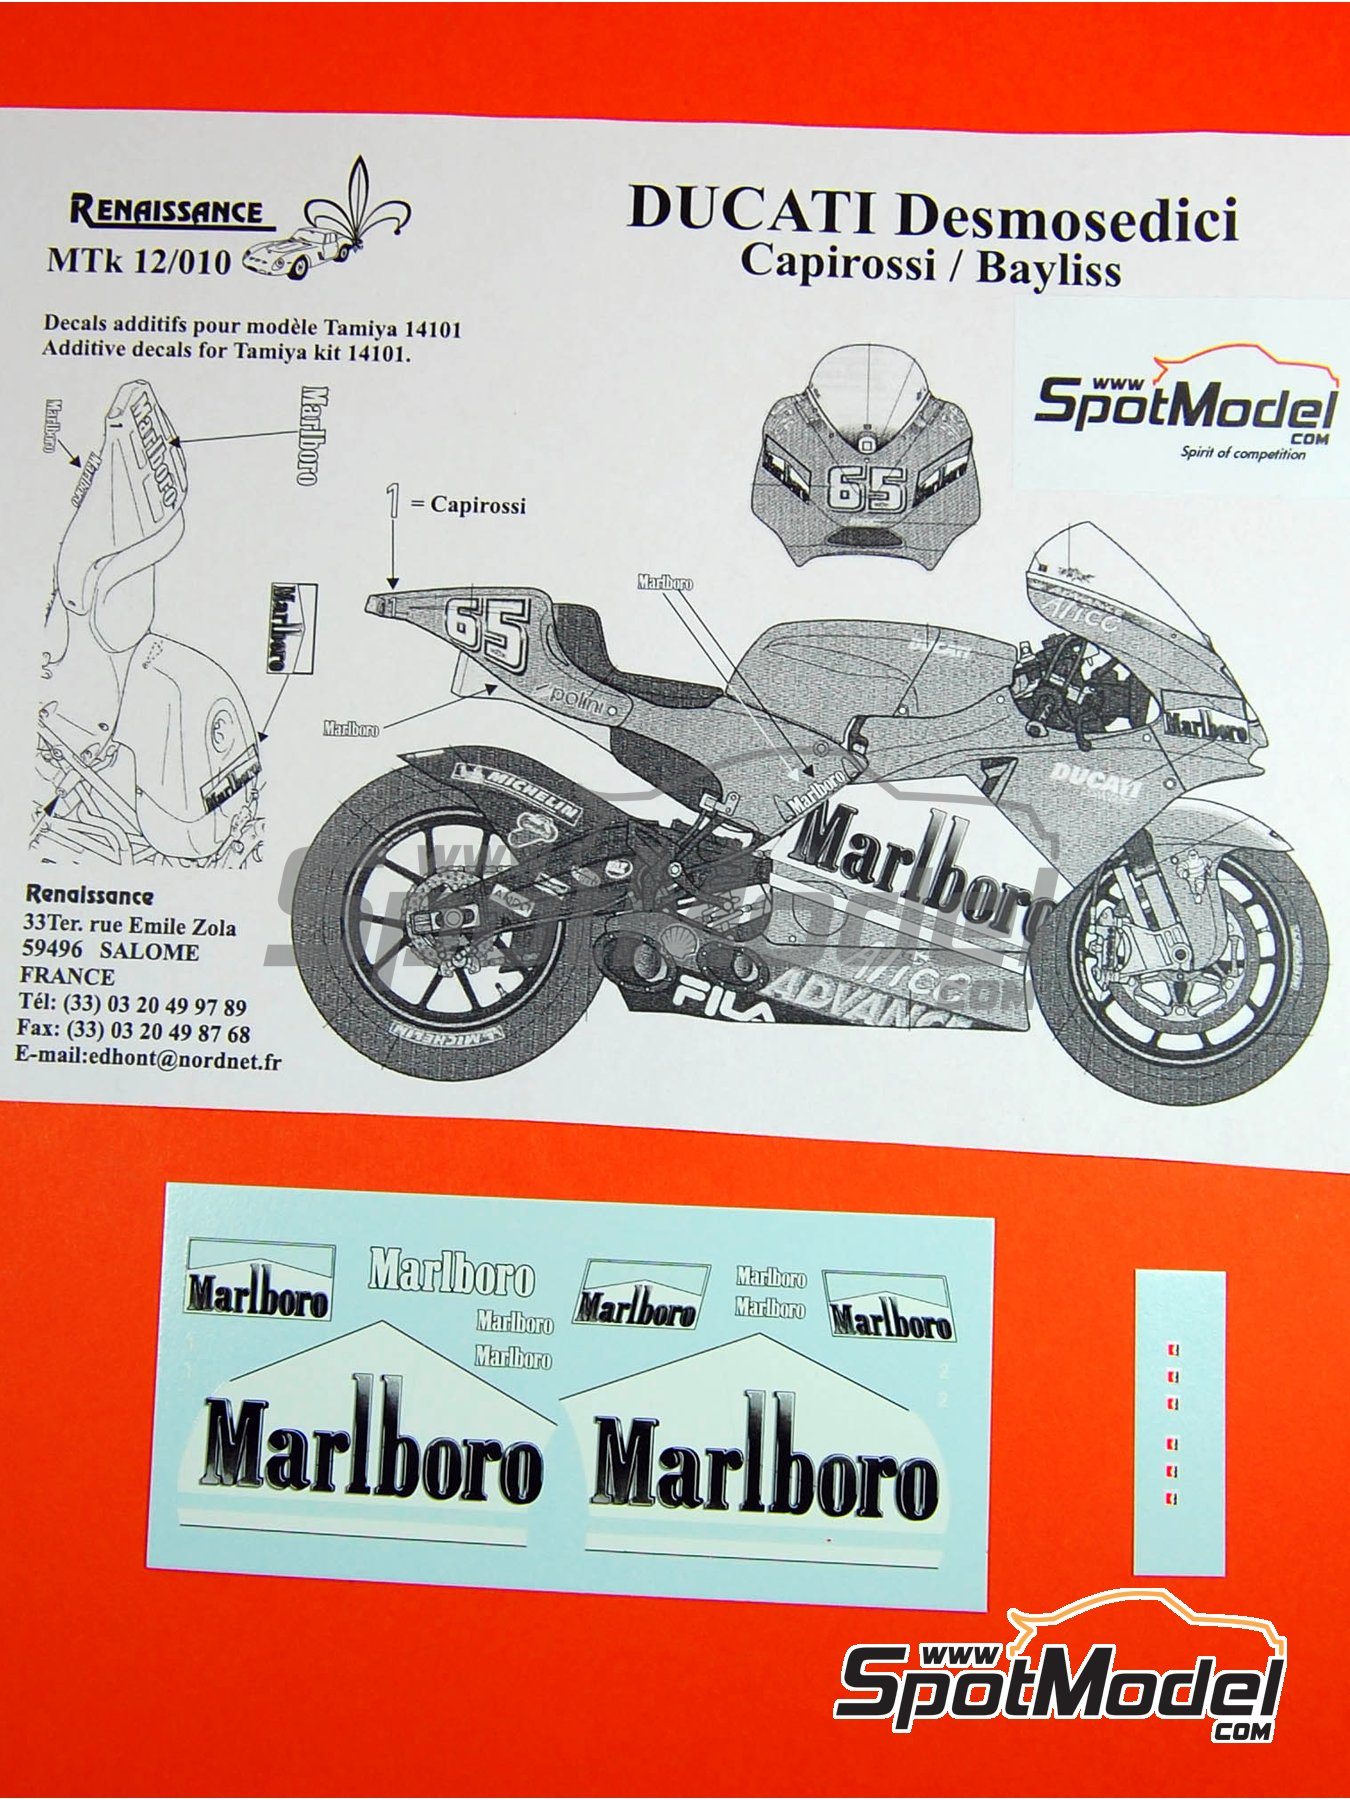 renaissance models logotypes 1 12 scale ducati desmosedici gp4 rh spotmodel com BMW Workshop Manual Store Workshop Manual